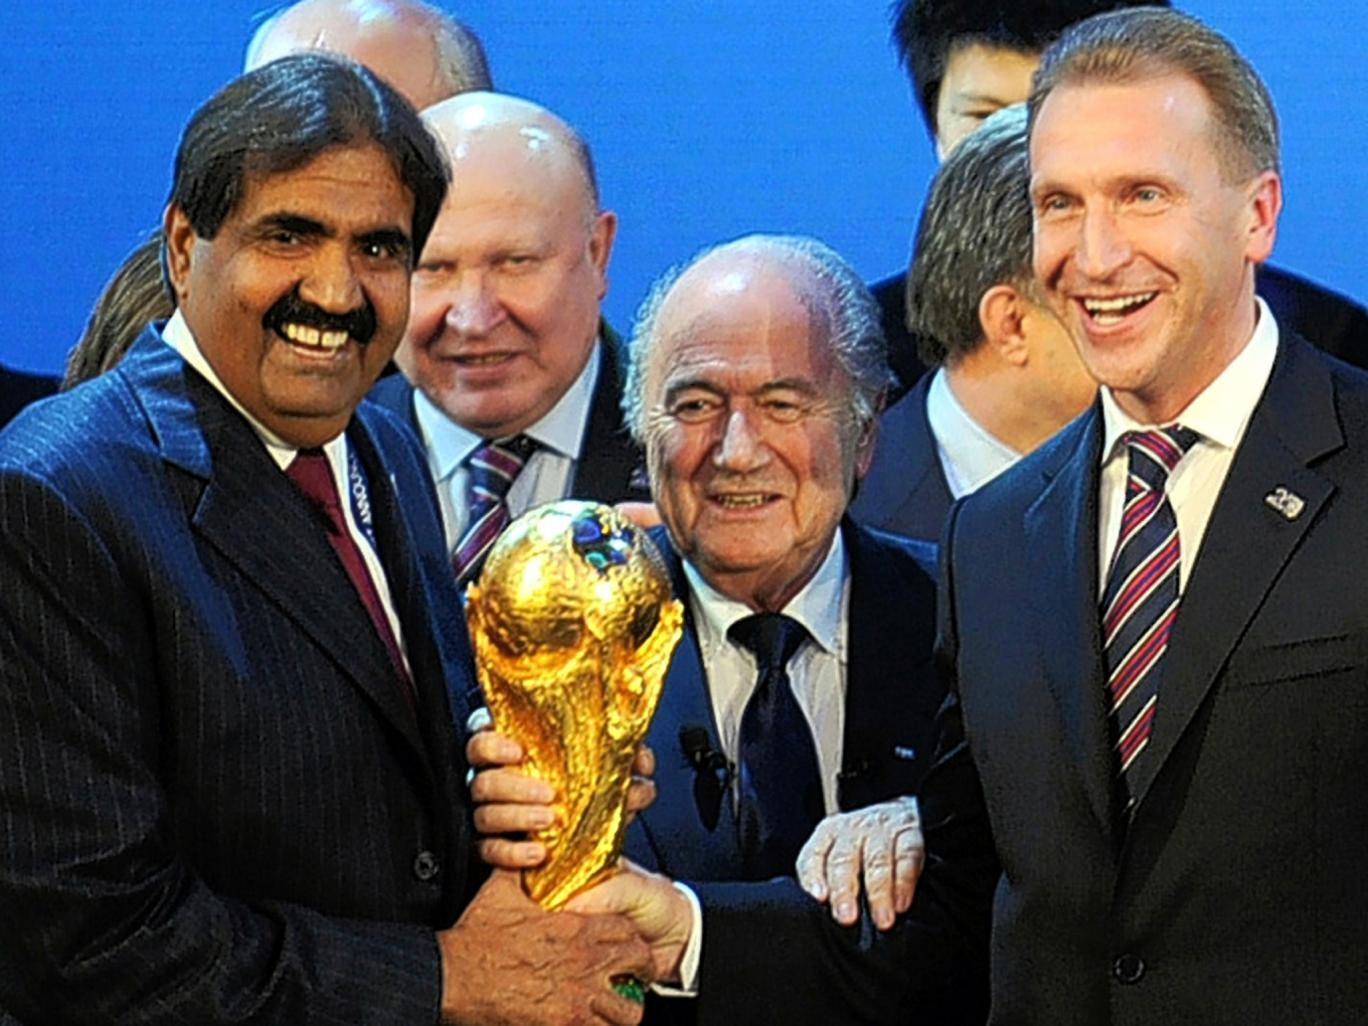 The Emir of Qatar Sheikh Hamad and Russia's deputy prime minister Igor Shuvalov flank Fifa president Sepp Blatter